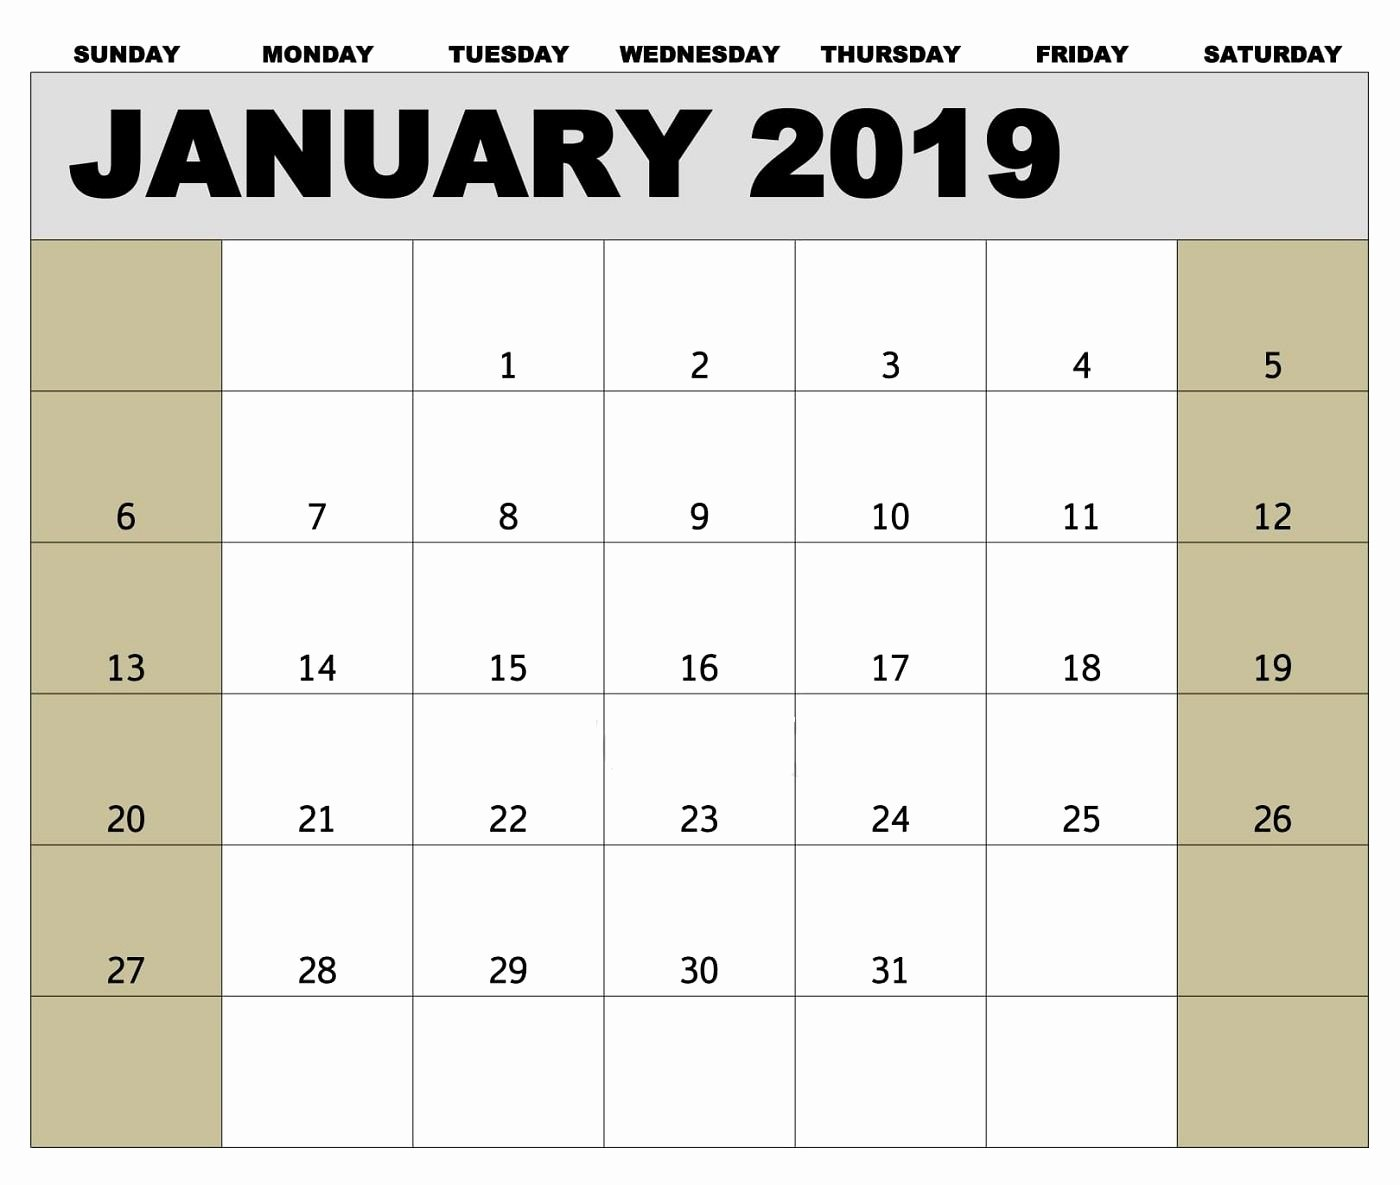 2019 Biweekly Payroll Calendar Template Excel Fresh 2019 Payroll Calendar Printable